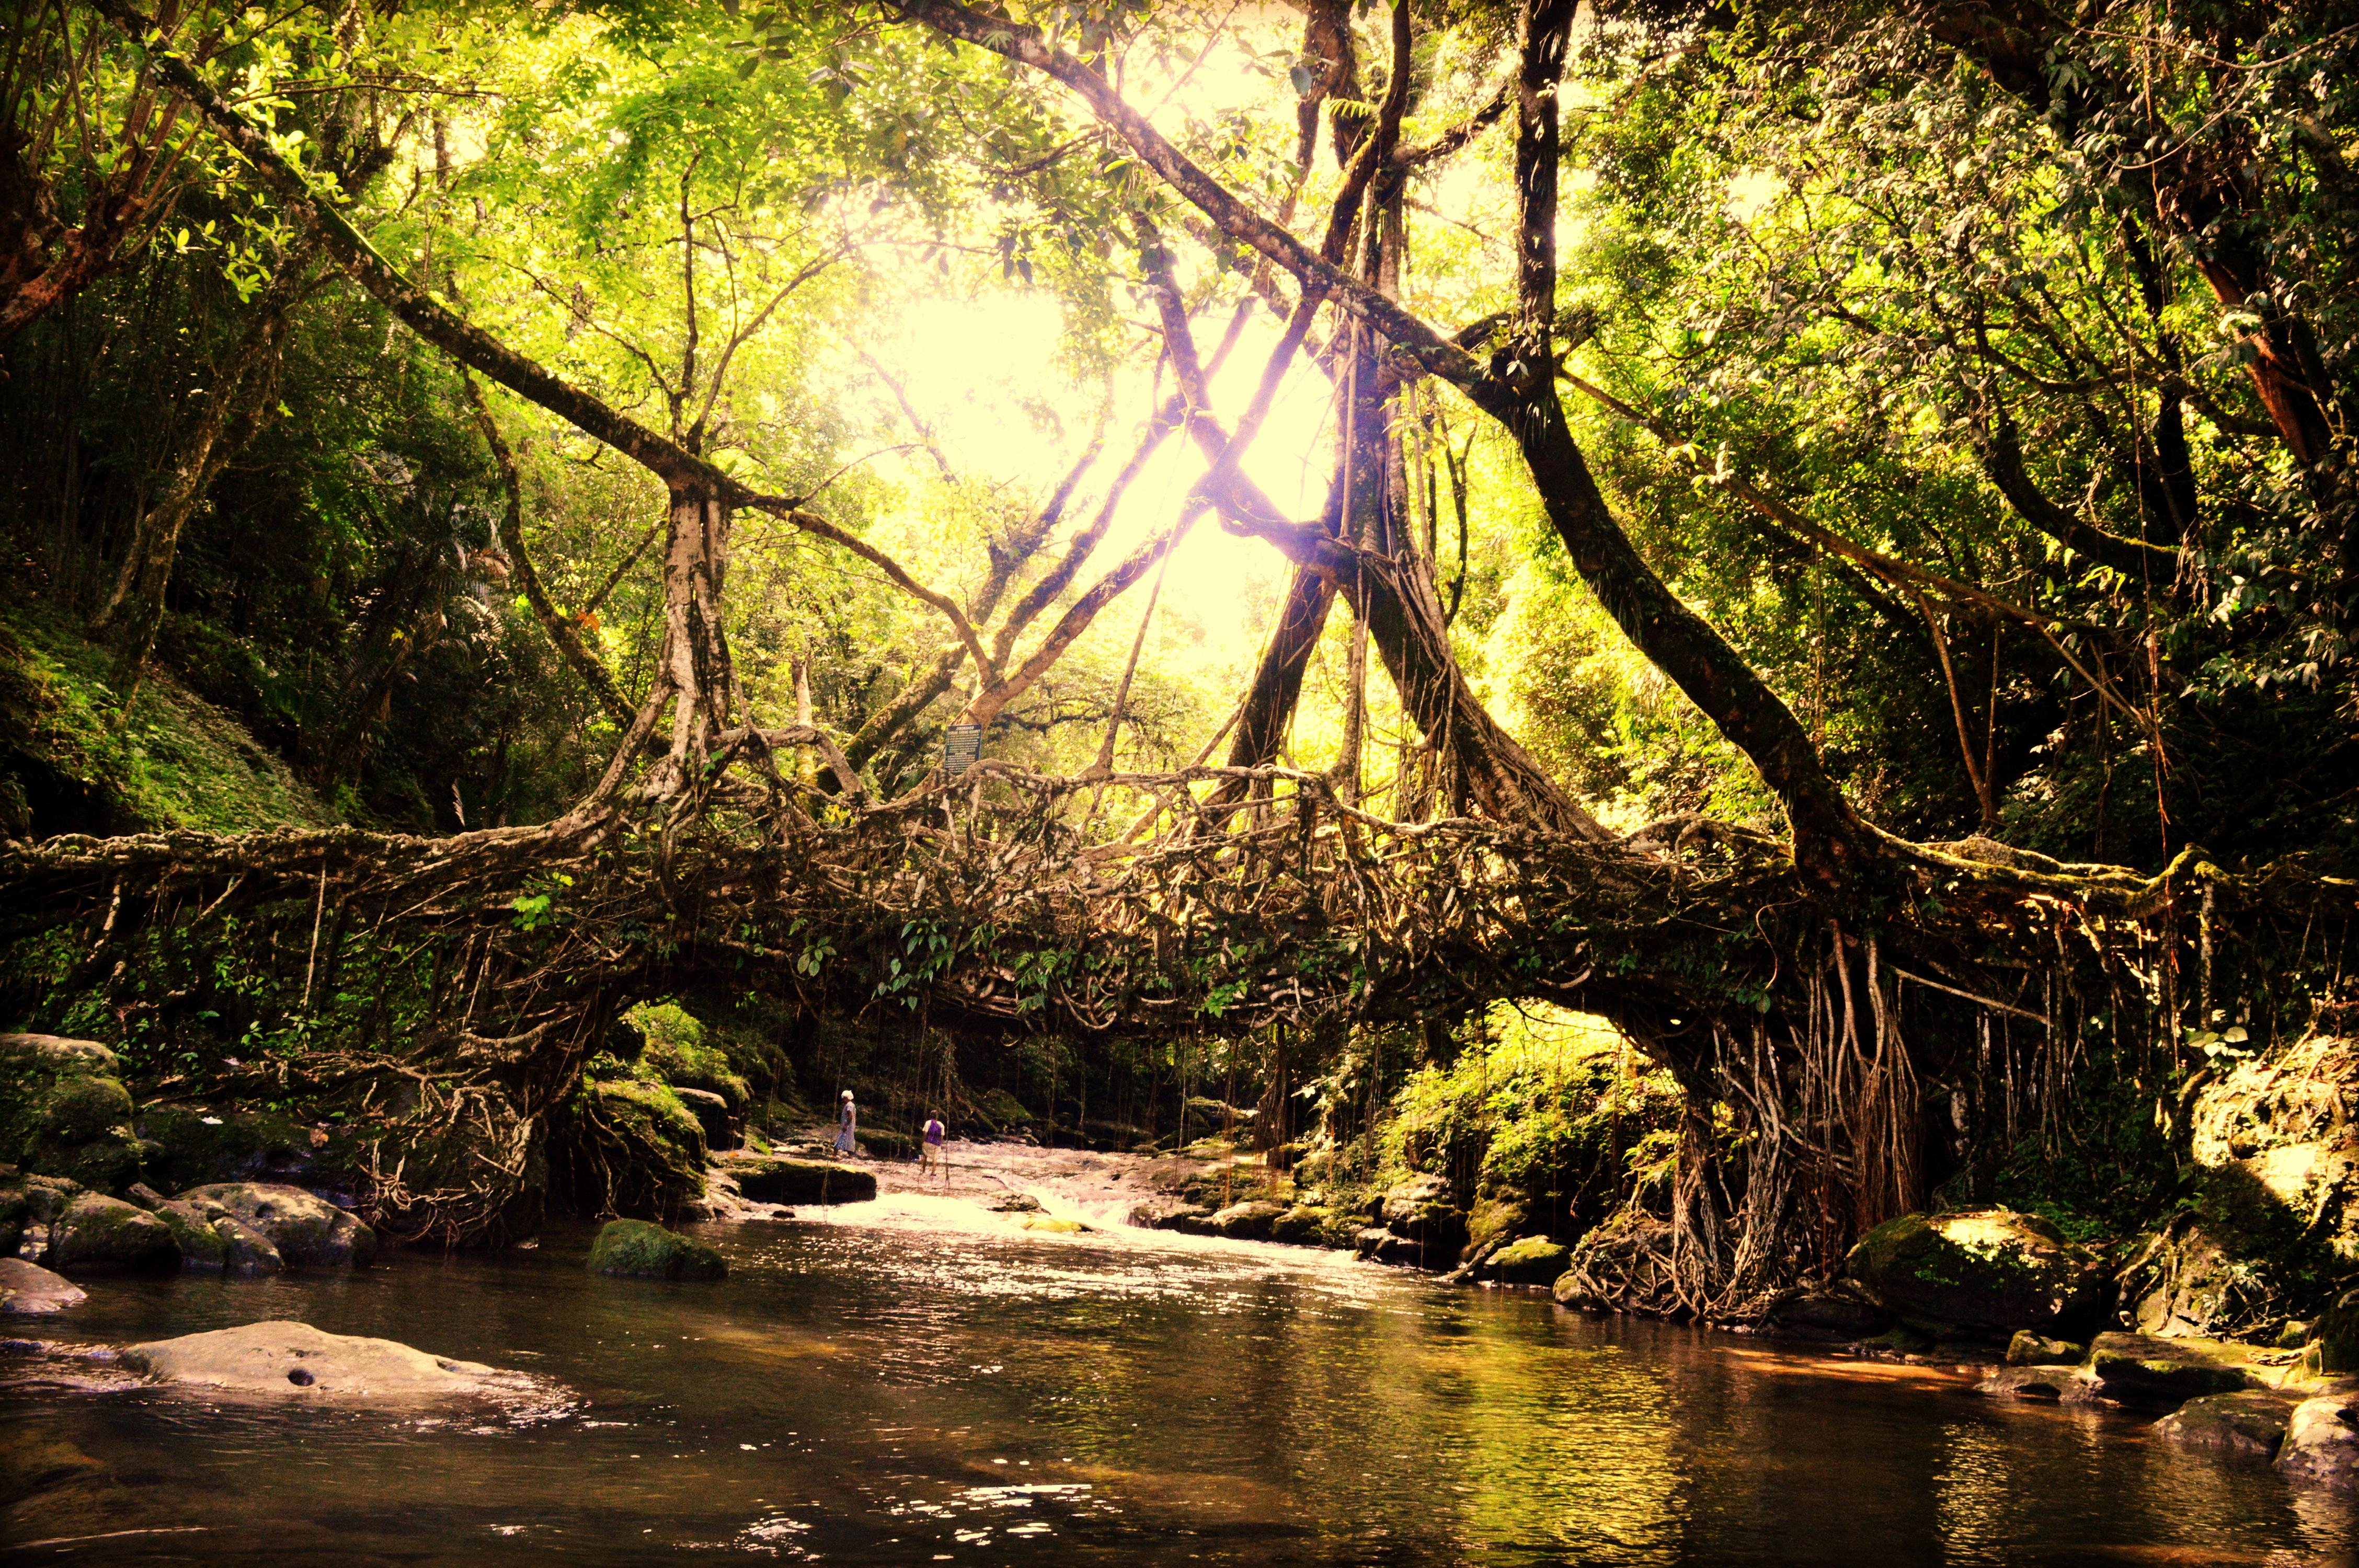 The Living Root Bridge in Meghalaya